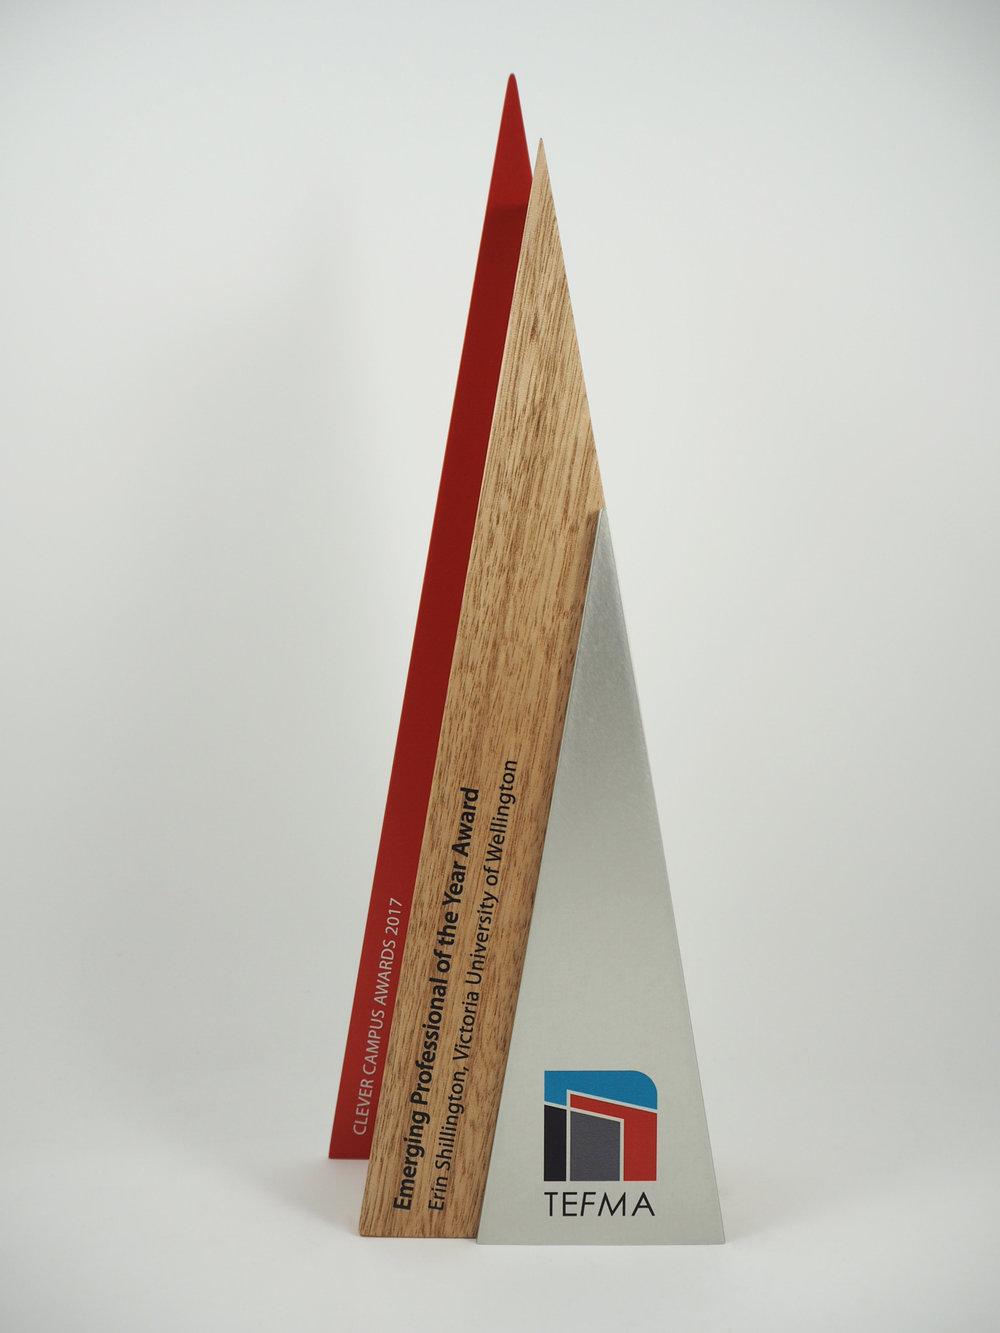 tefma-awards-timber-eco-aluminium-trophy-02.jpg